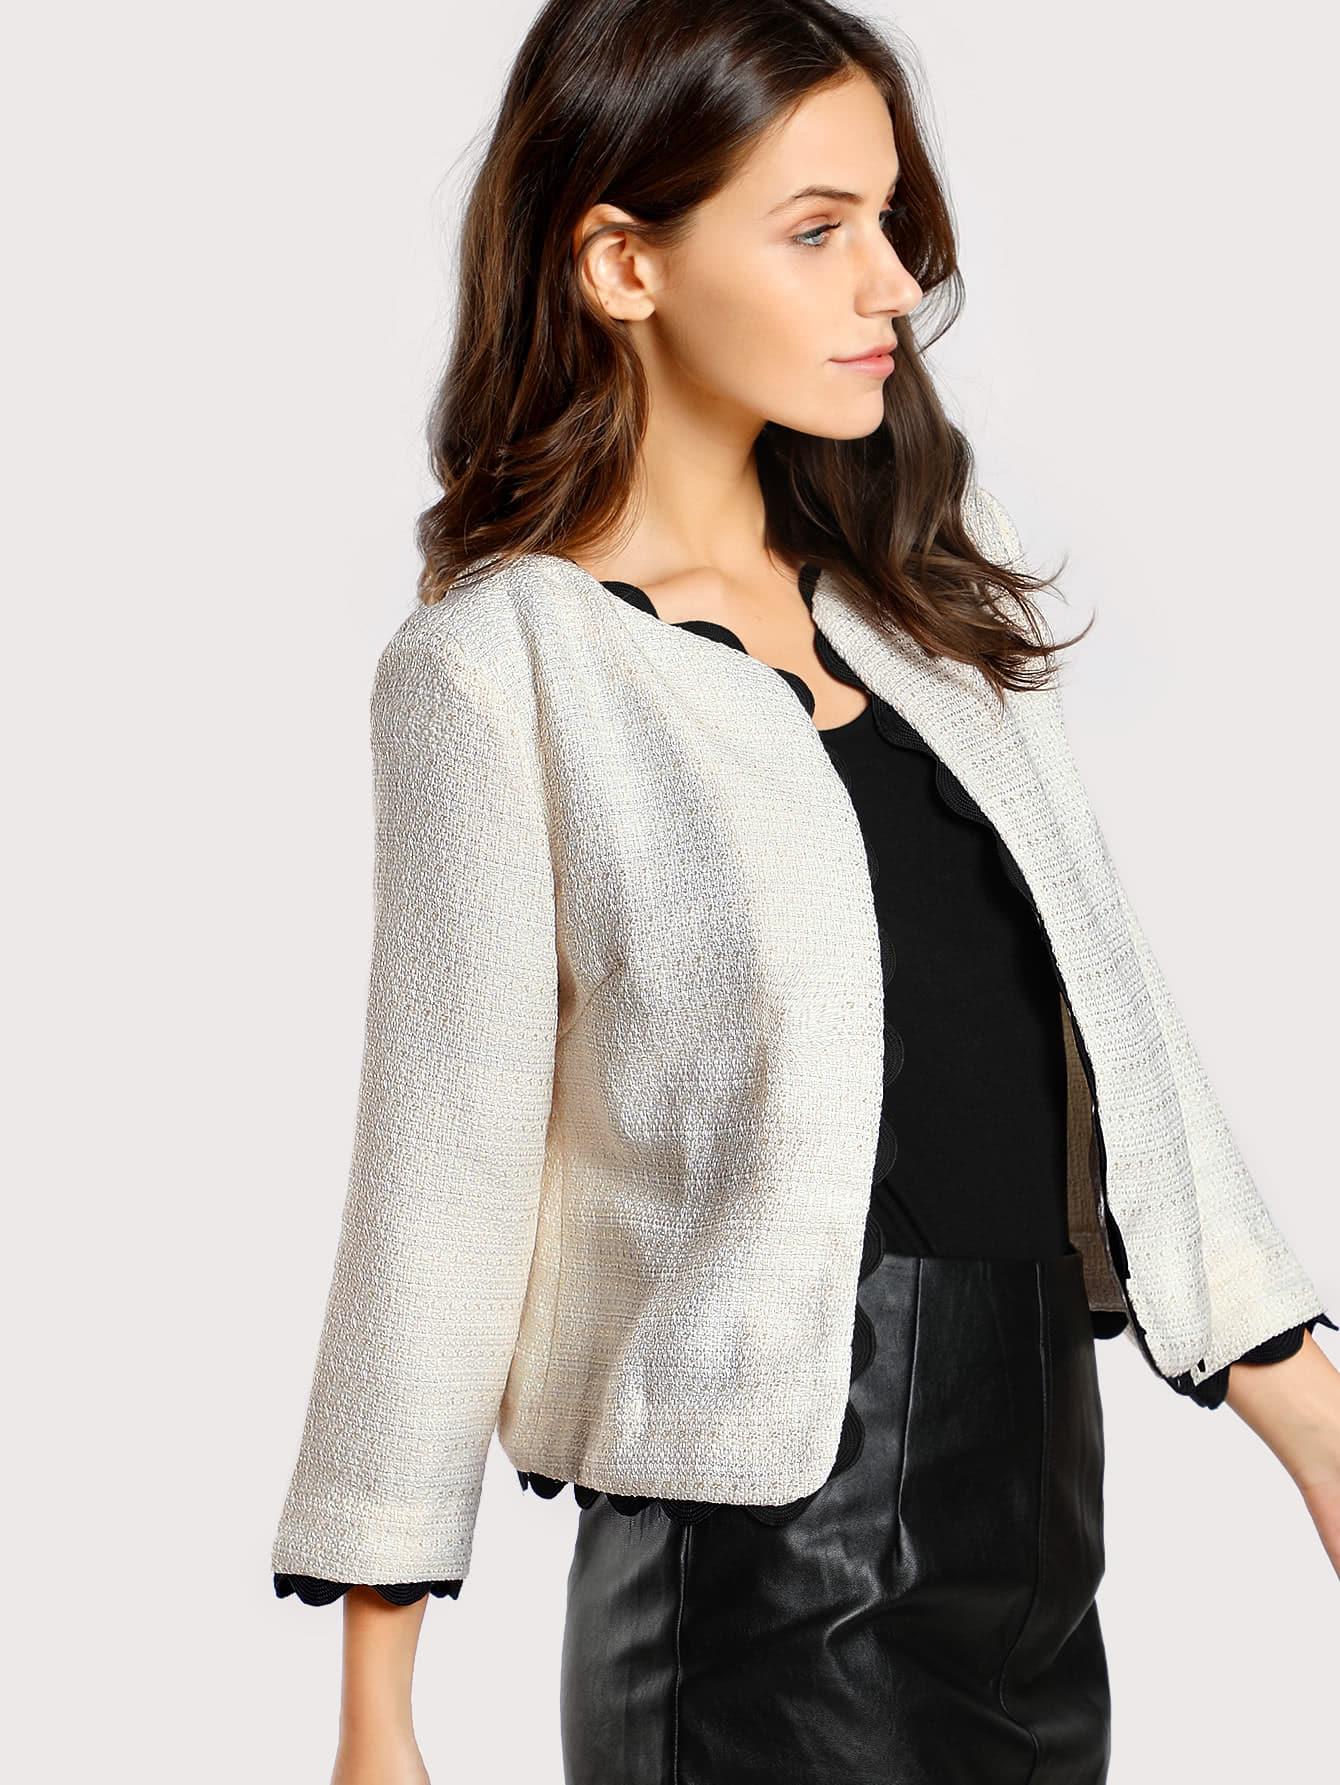 Contrast Scallop Crochet Trim Tweed Blazer contrast scallop trim balloon sleeve shirt